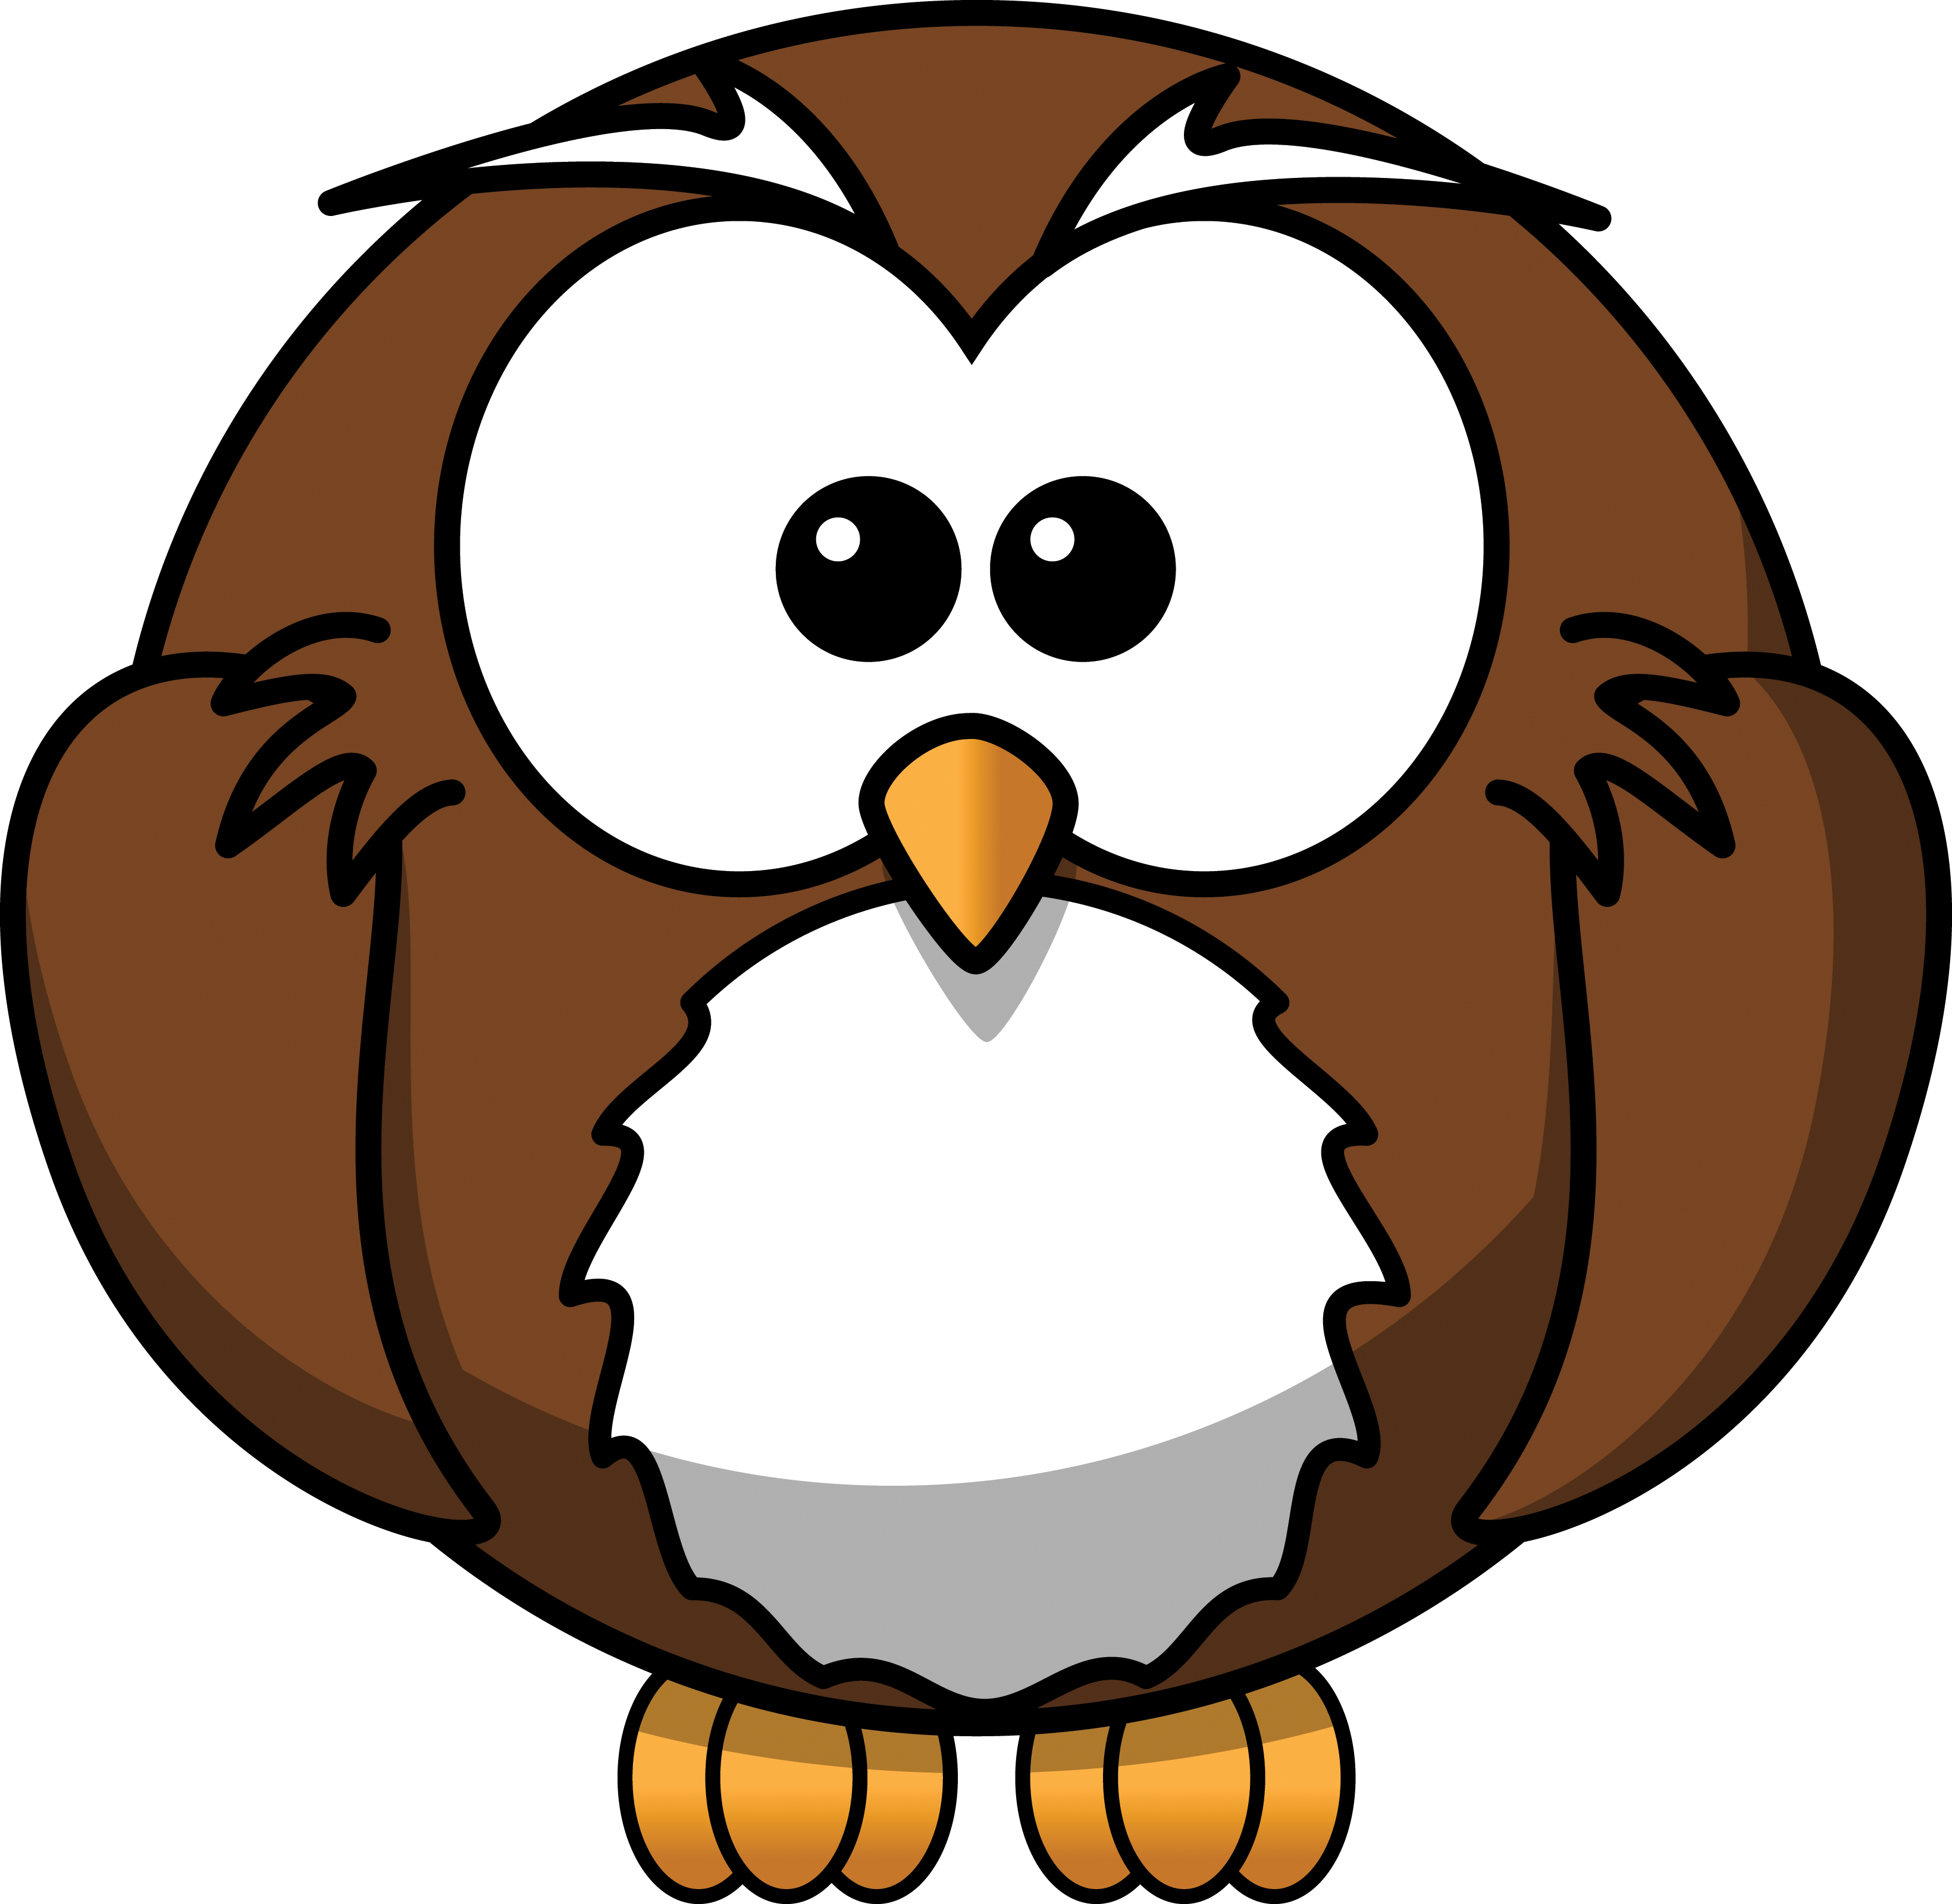 Cute Owl Mascot